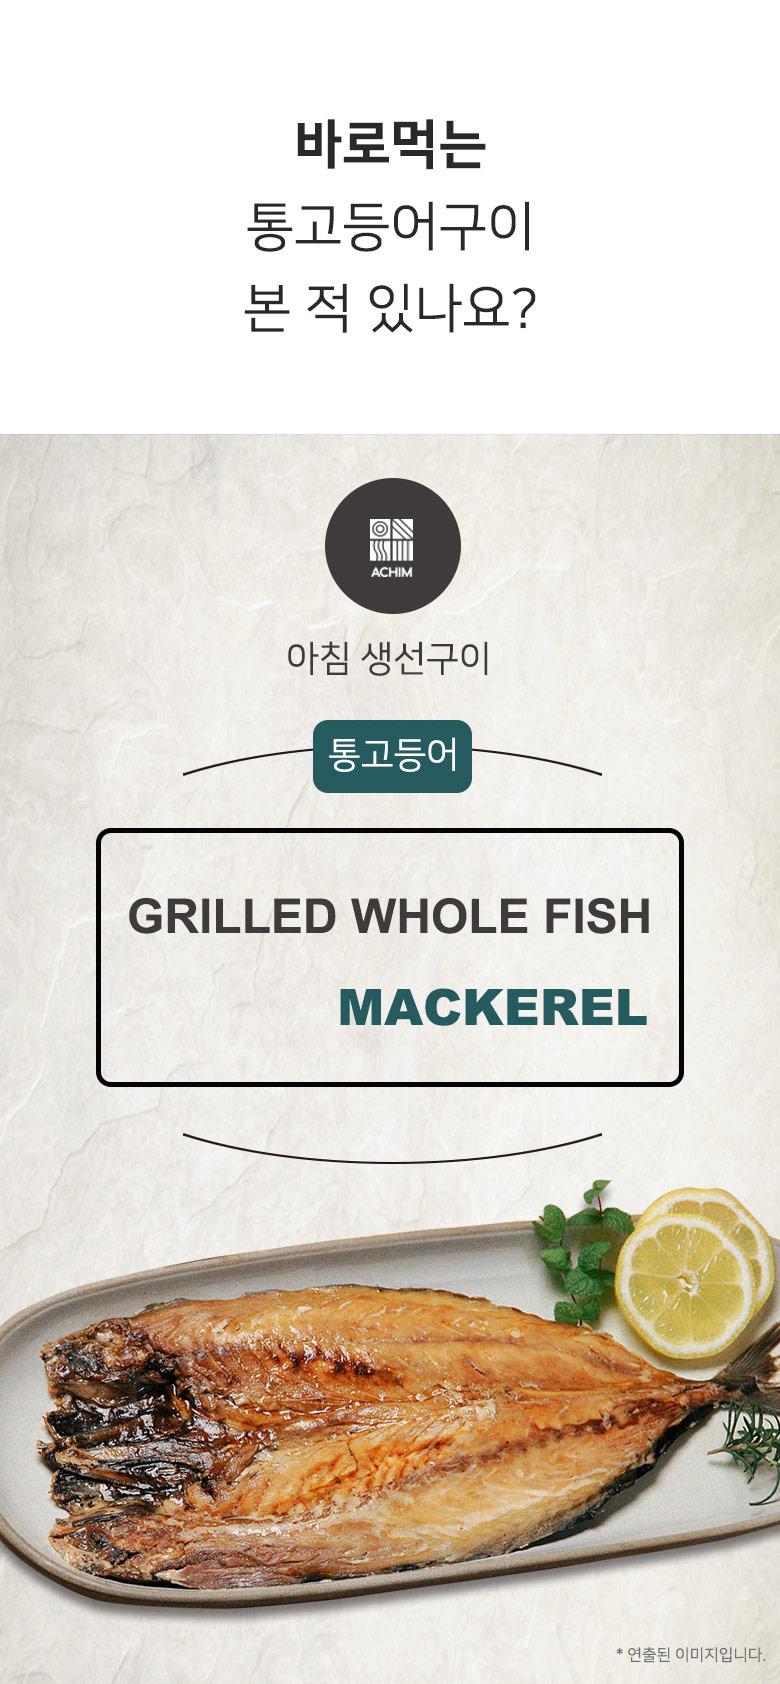 achim_whole_mackerel_02_shop1_135329.jpg